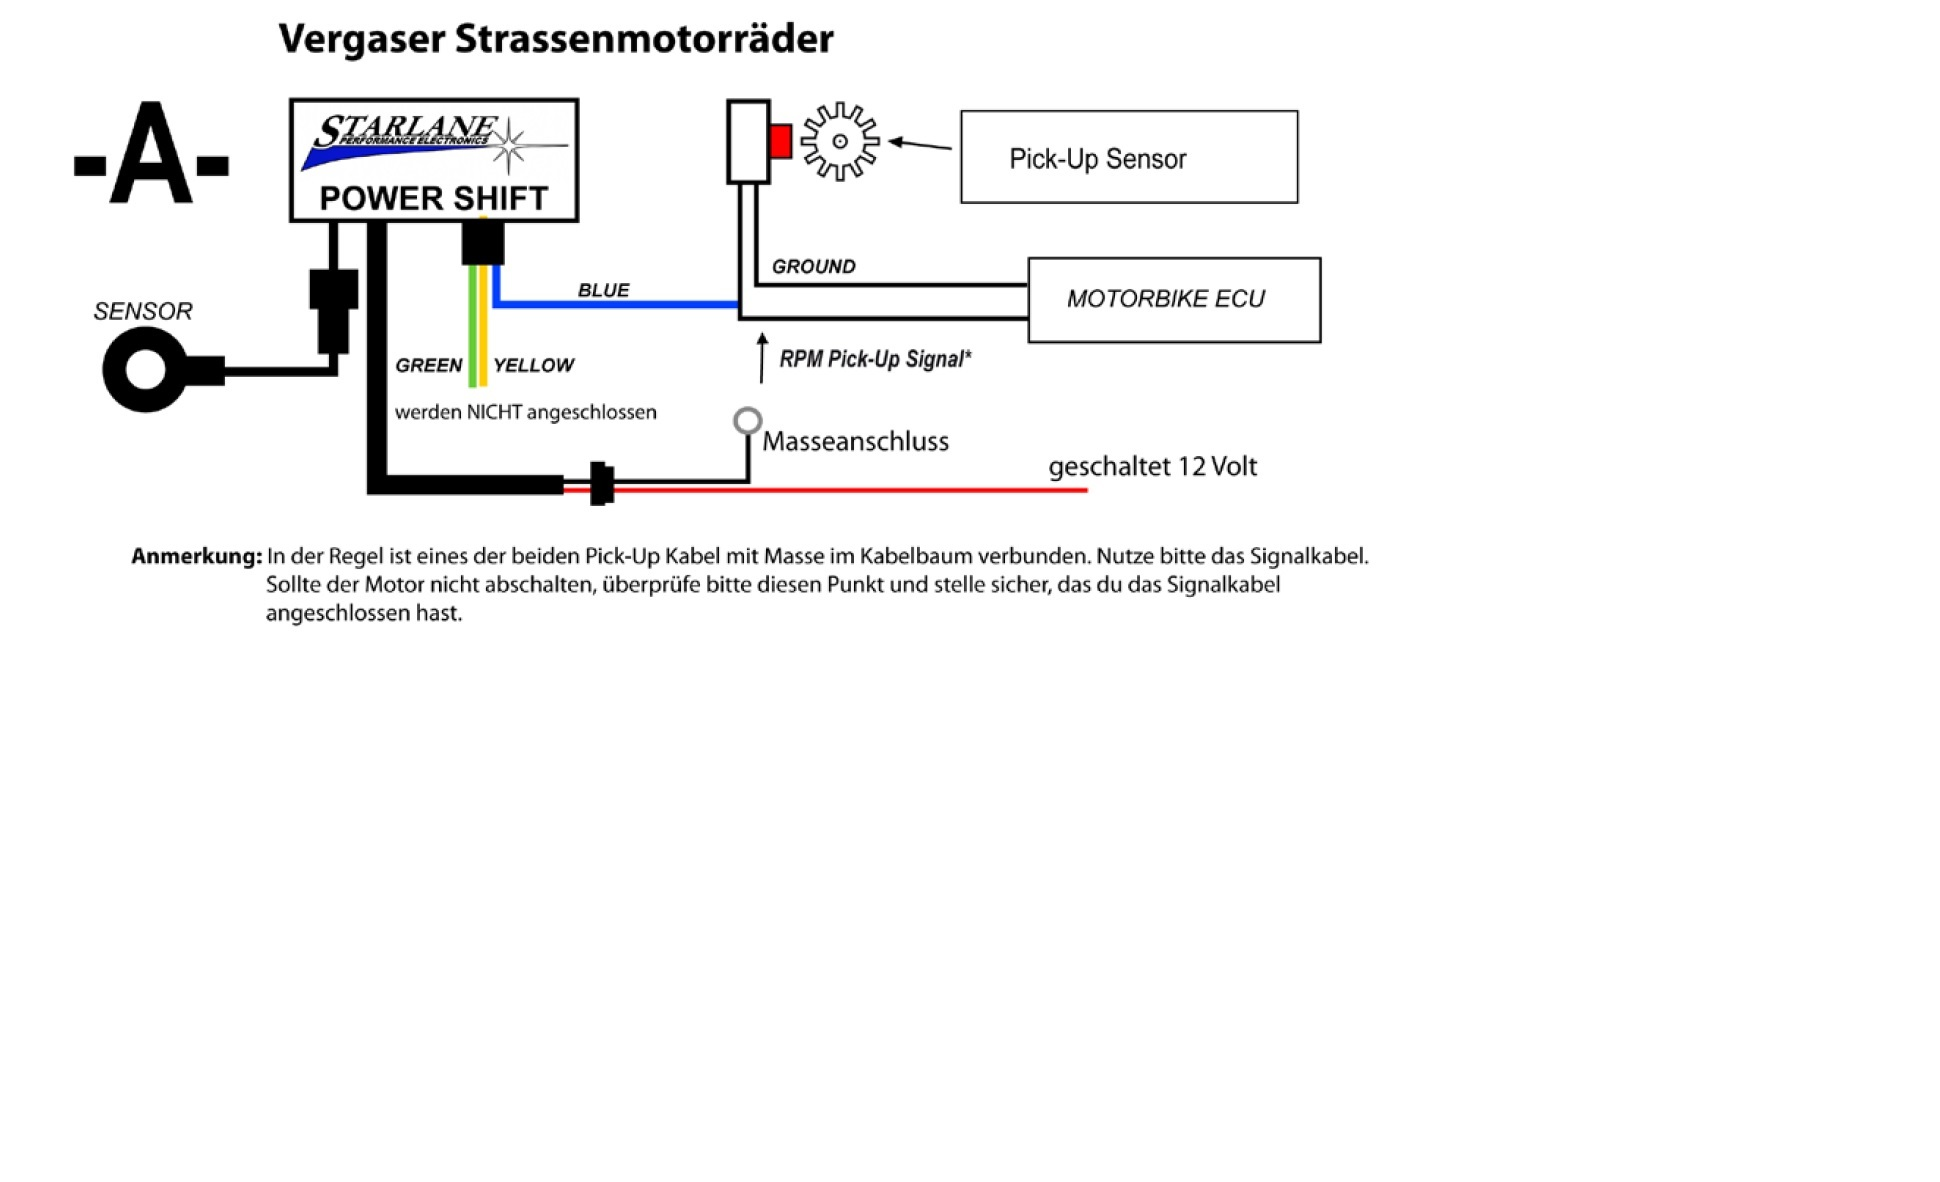 Fantastisch Universelles Schmerzloses Kabelbaum Diagramm Ideen - Der ...